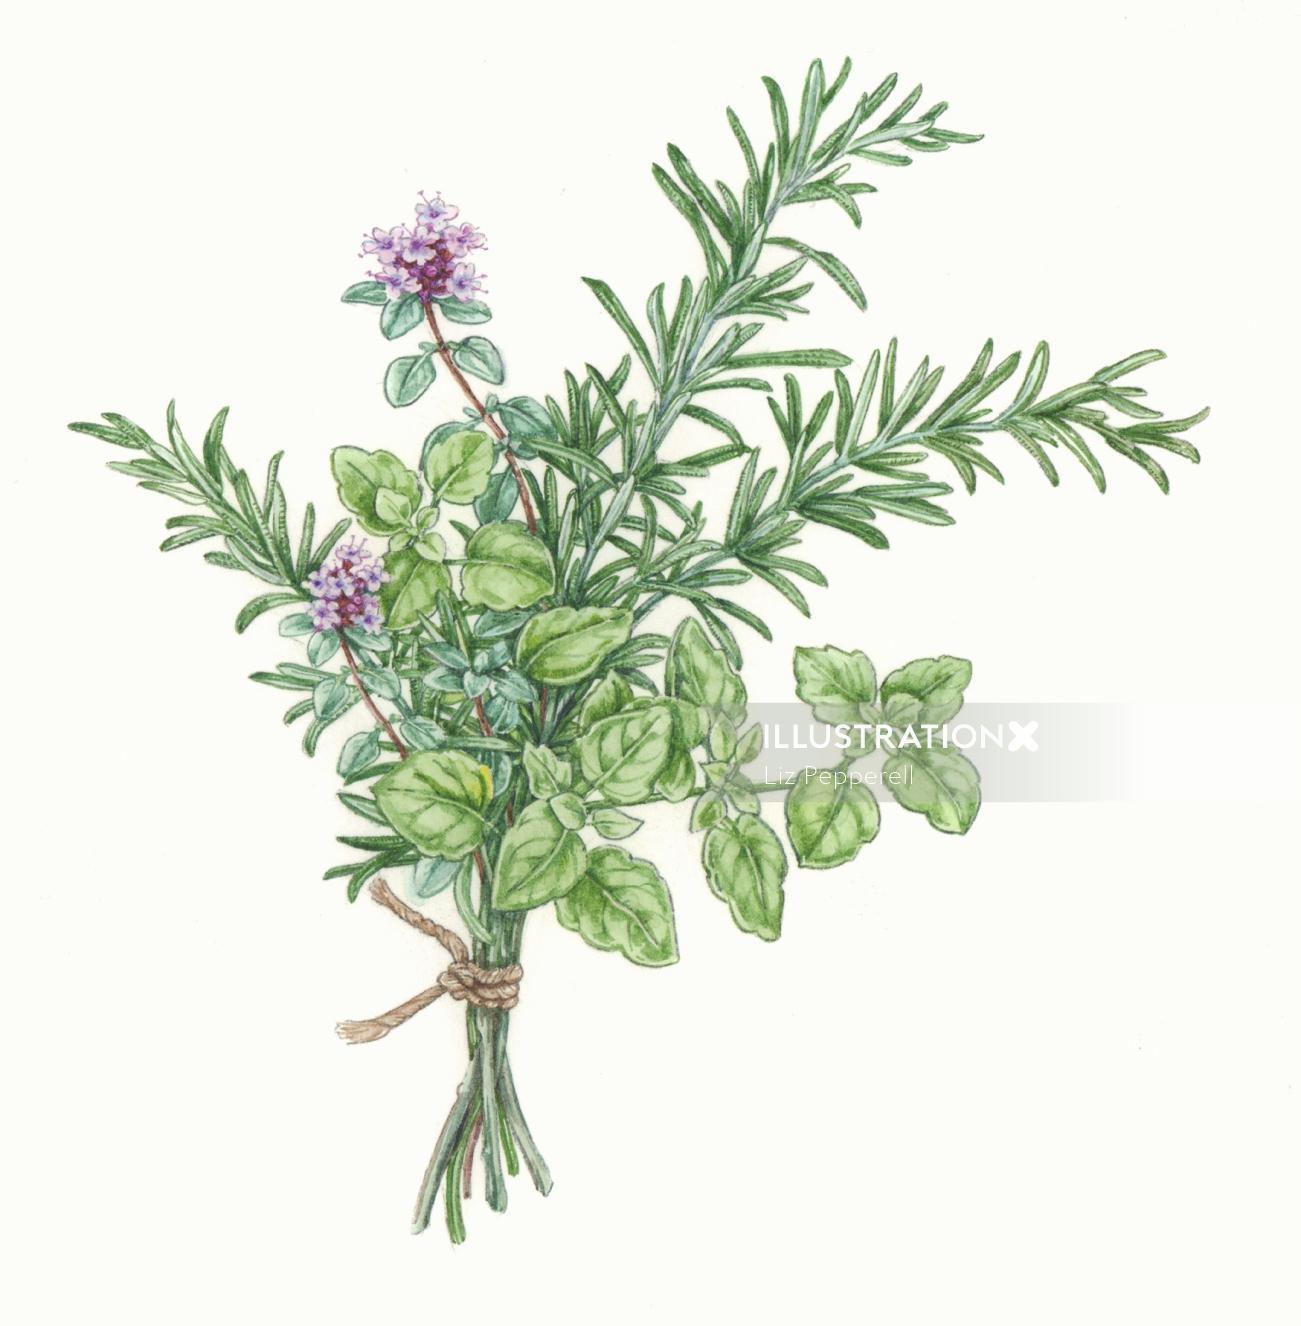 Food illustration of Herb Vegetable